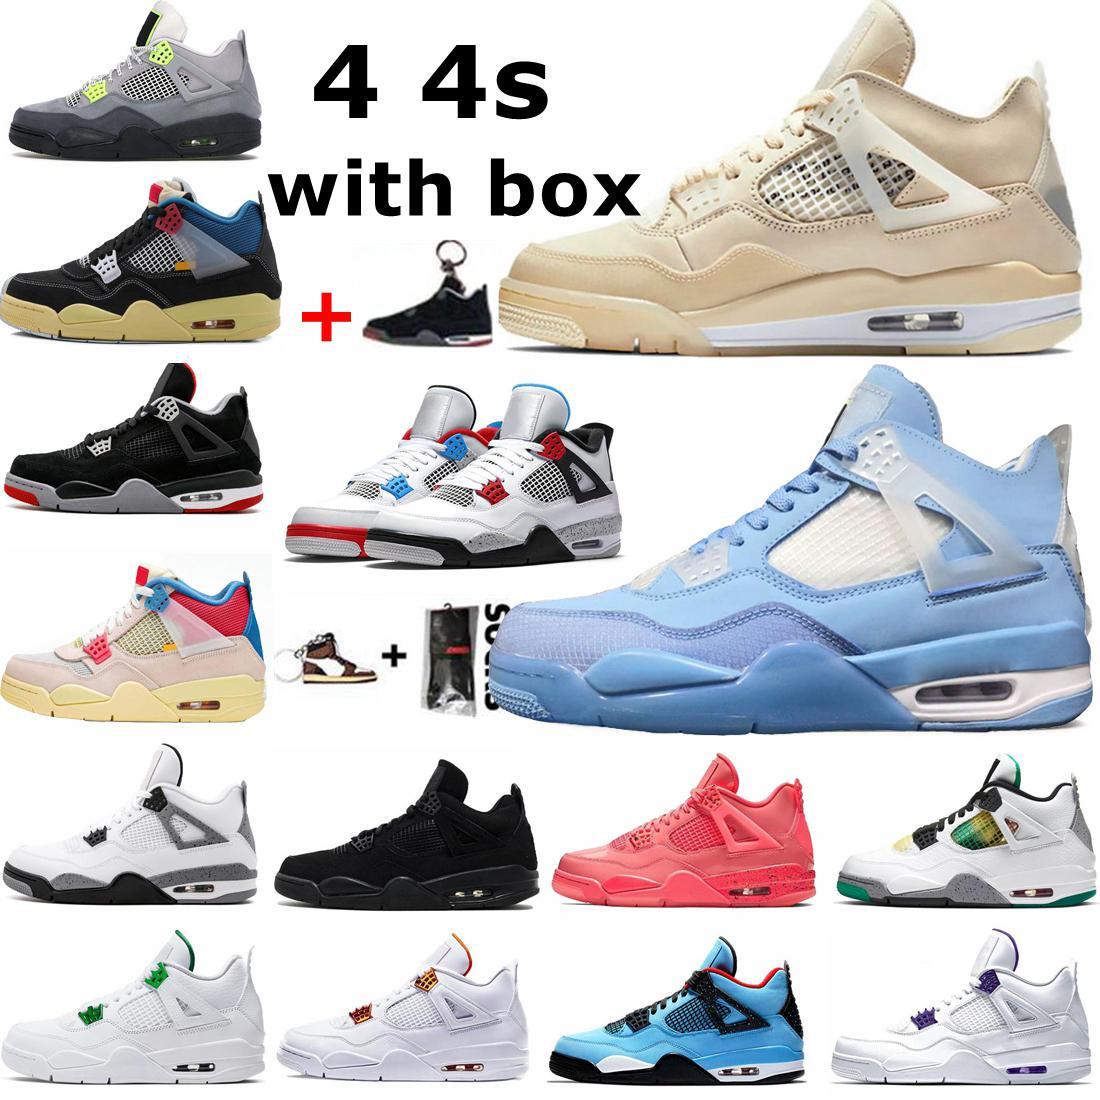 New Nike air jordan 4 4s retro White Sail What The Chaussures Hommes Nouveau Noir Blanc Rouge Tns TN plus Chaussures Ultra Sports Cheap TN Requin Fashion Sneakers Casual